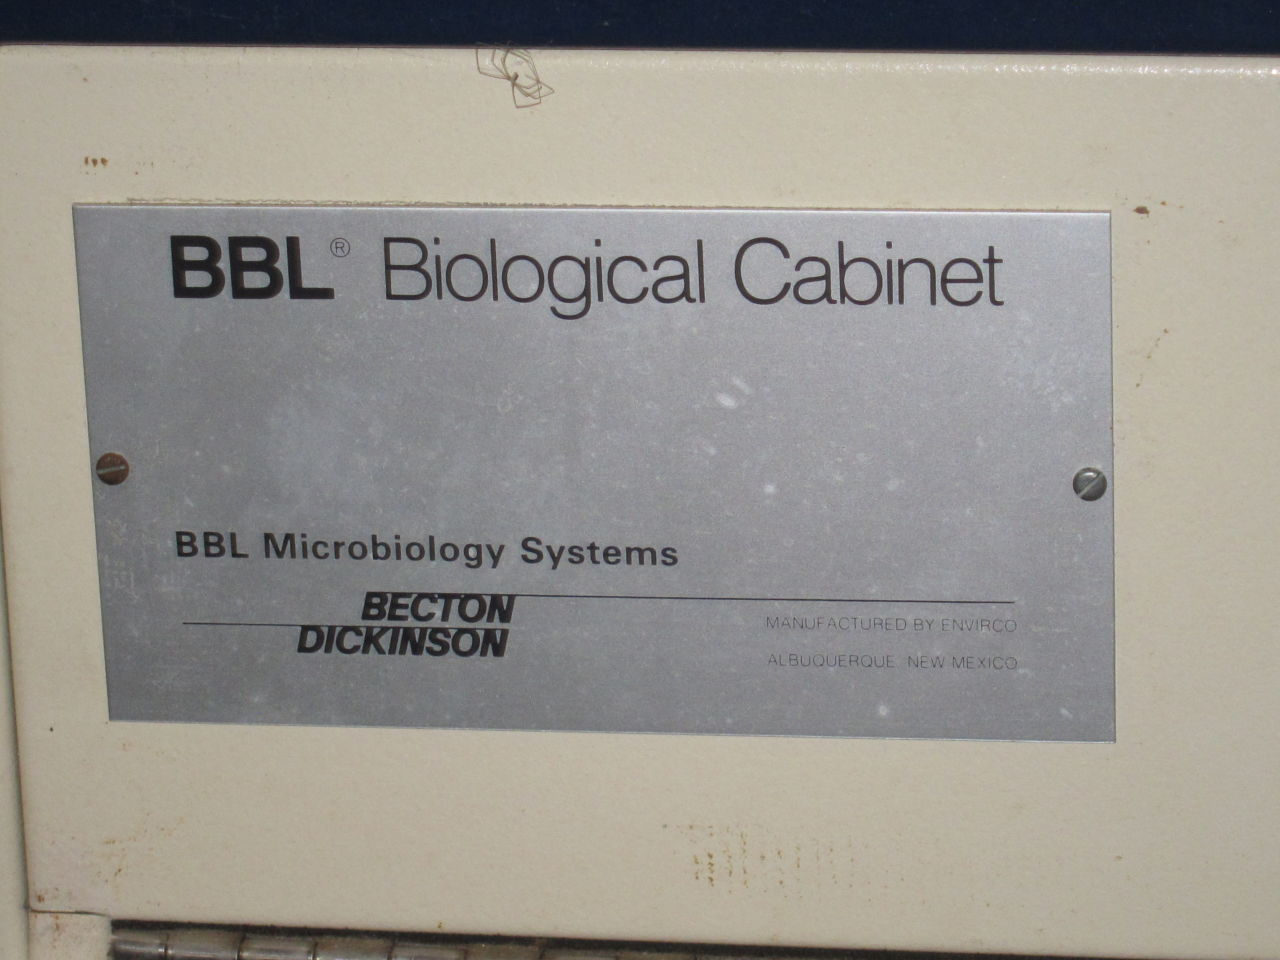 BECTON DICKINSON 60474 Fume/Bio Safety Hood